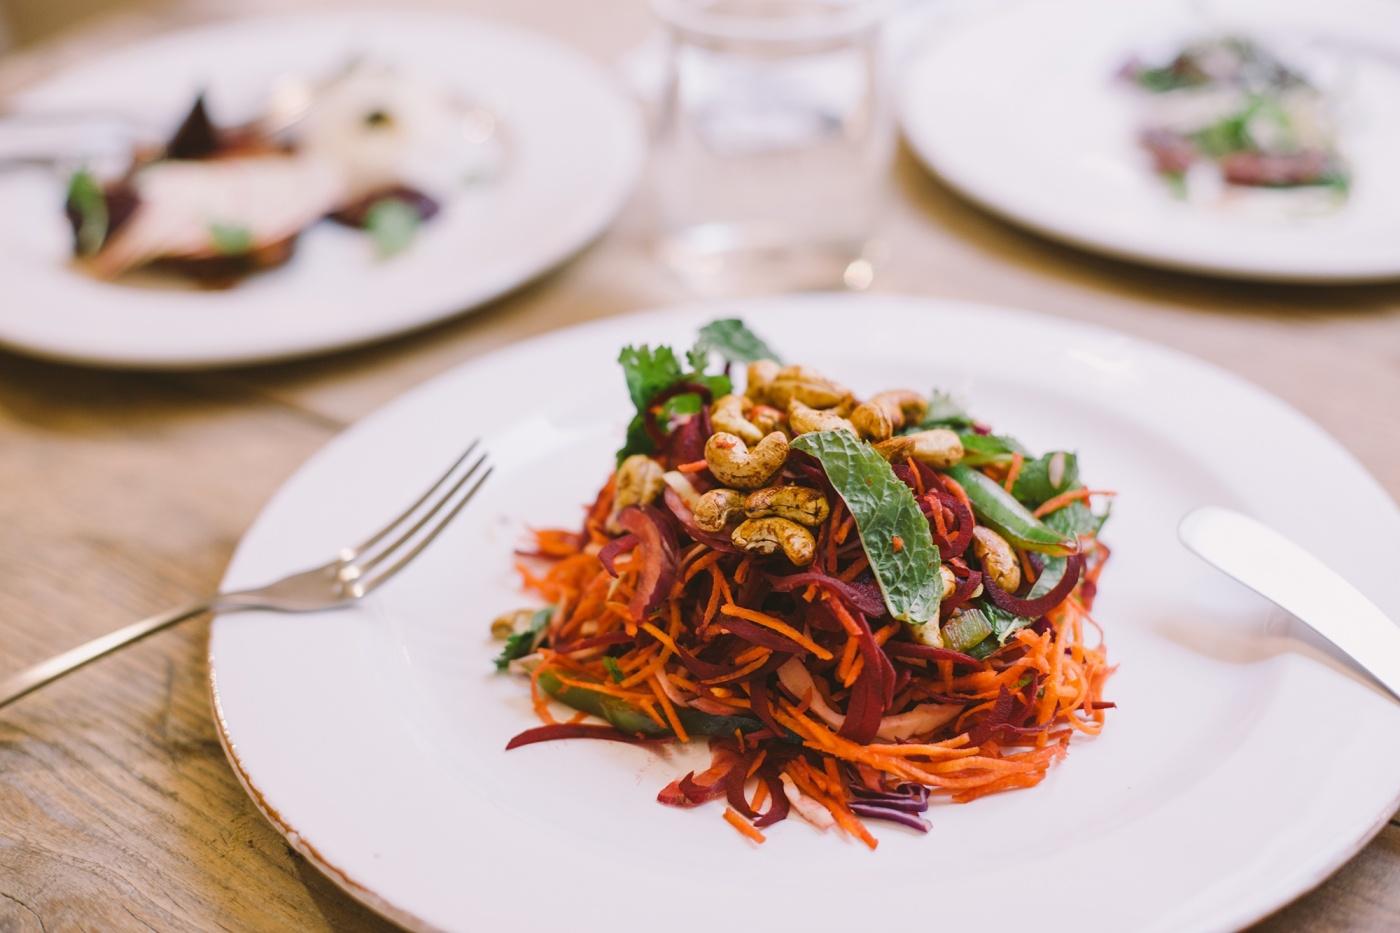 Daylesford's Raw Salad